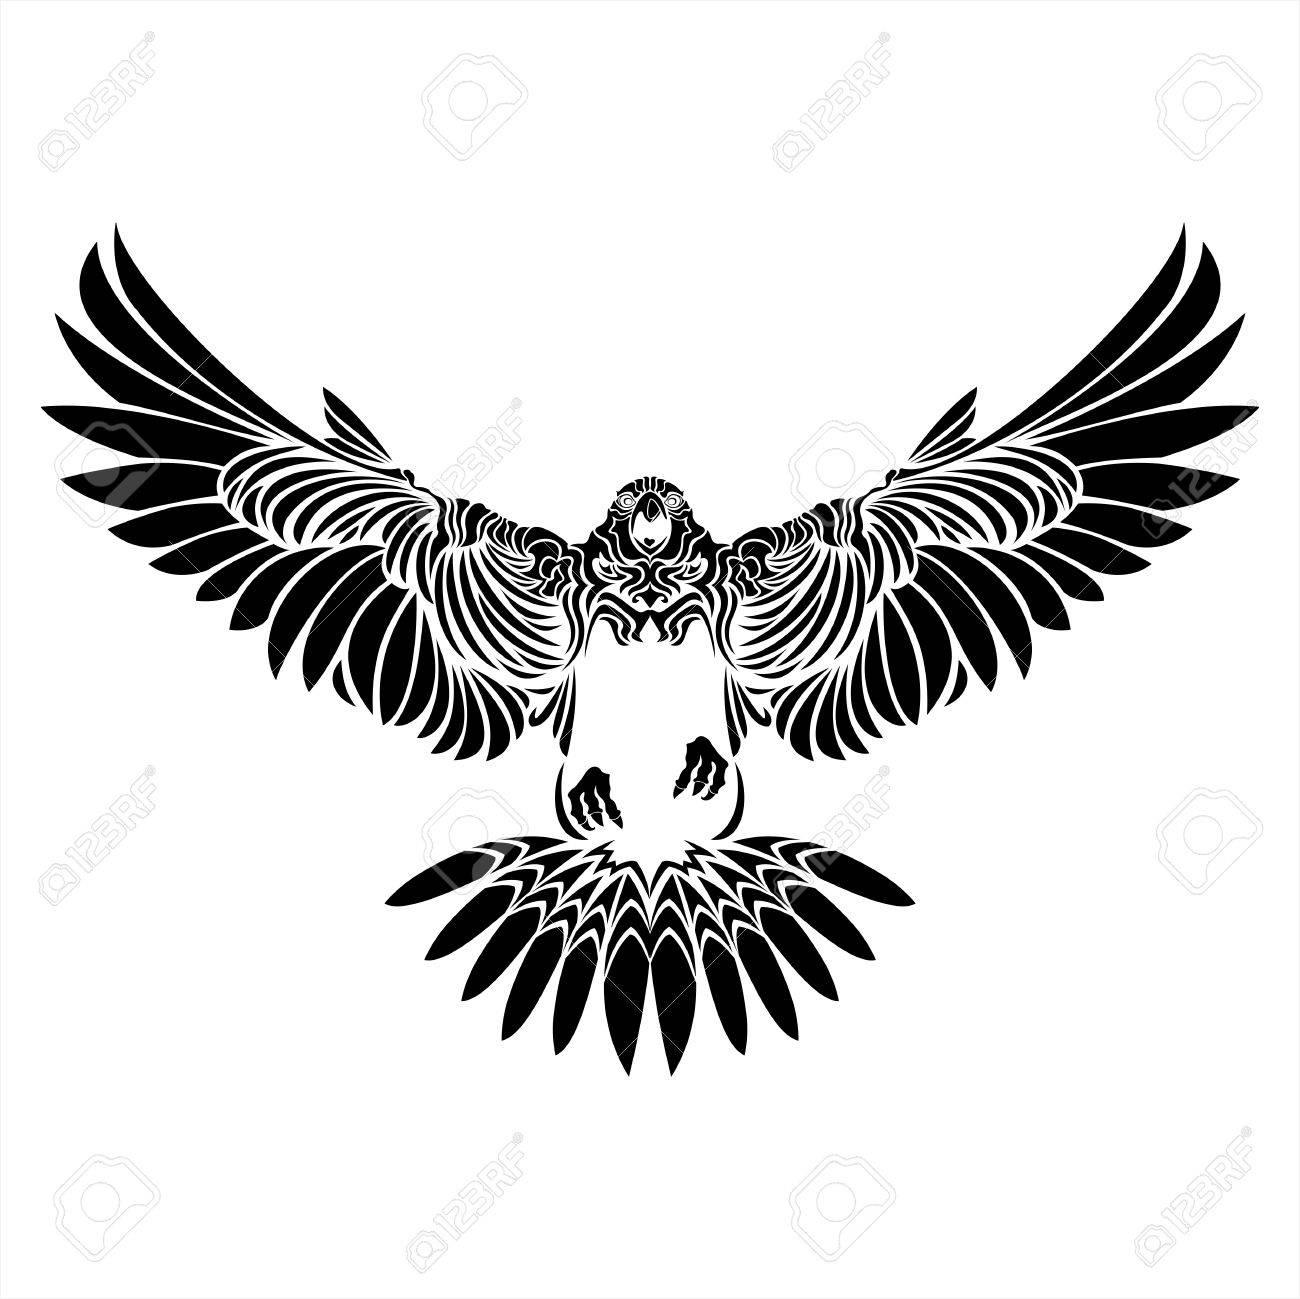 Tatuaje Aguila halcón, águila, halcón, negro, blanco, tatuaje, detalles, pájaro